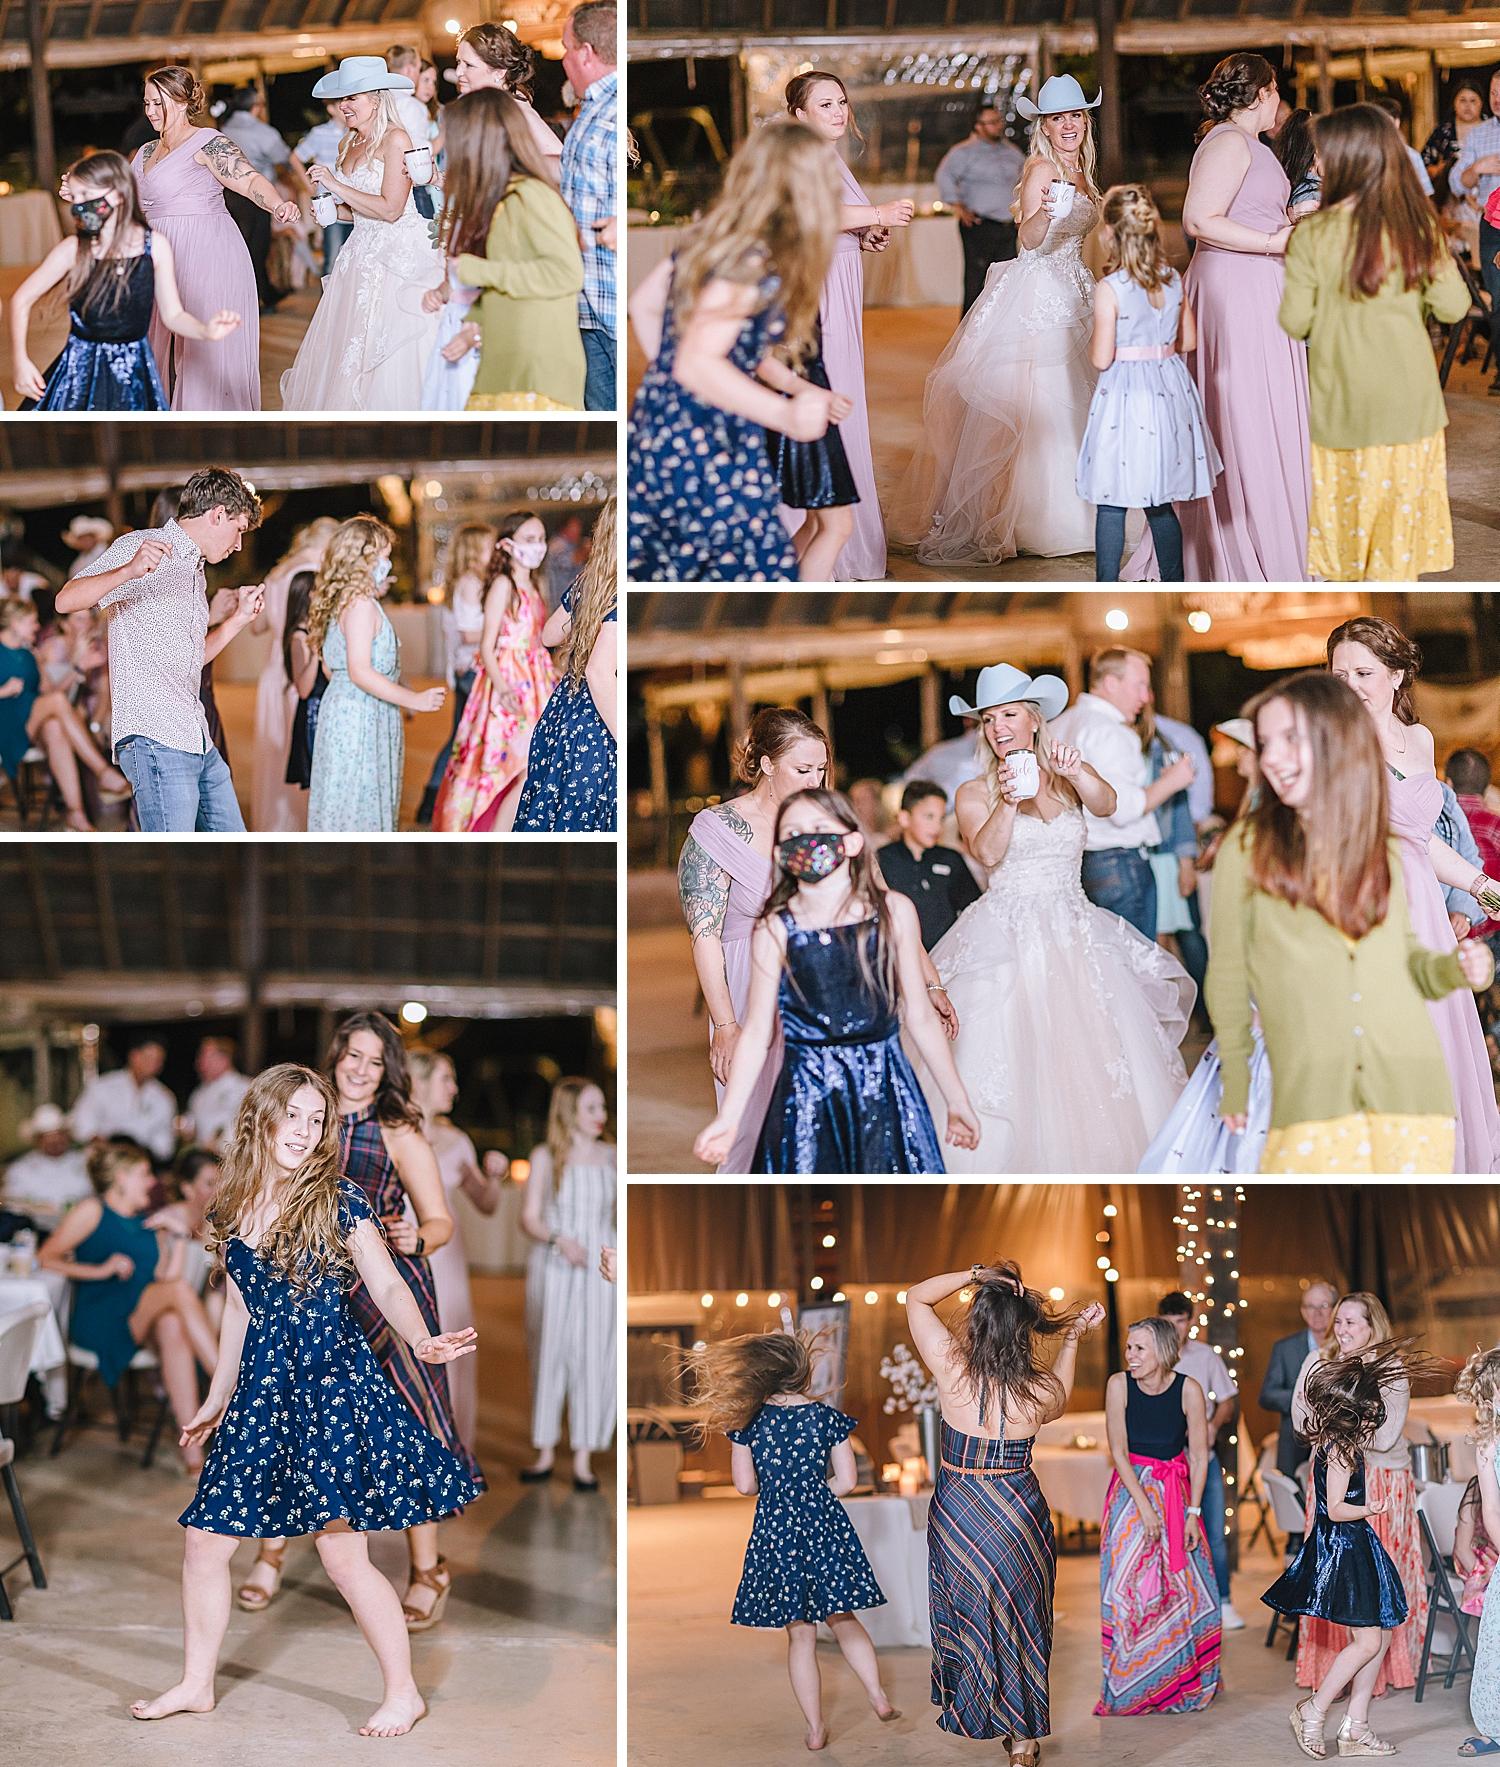 Rio-Cibilo-Ranch-Marion-Texas-Wedding-Rustic-Blush-Rose-Quartz-Details-Carly-Barton-Photography_0091.jpg